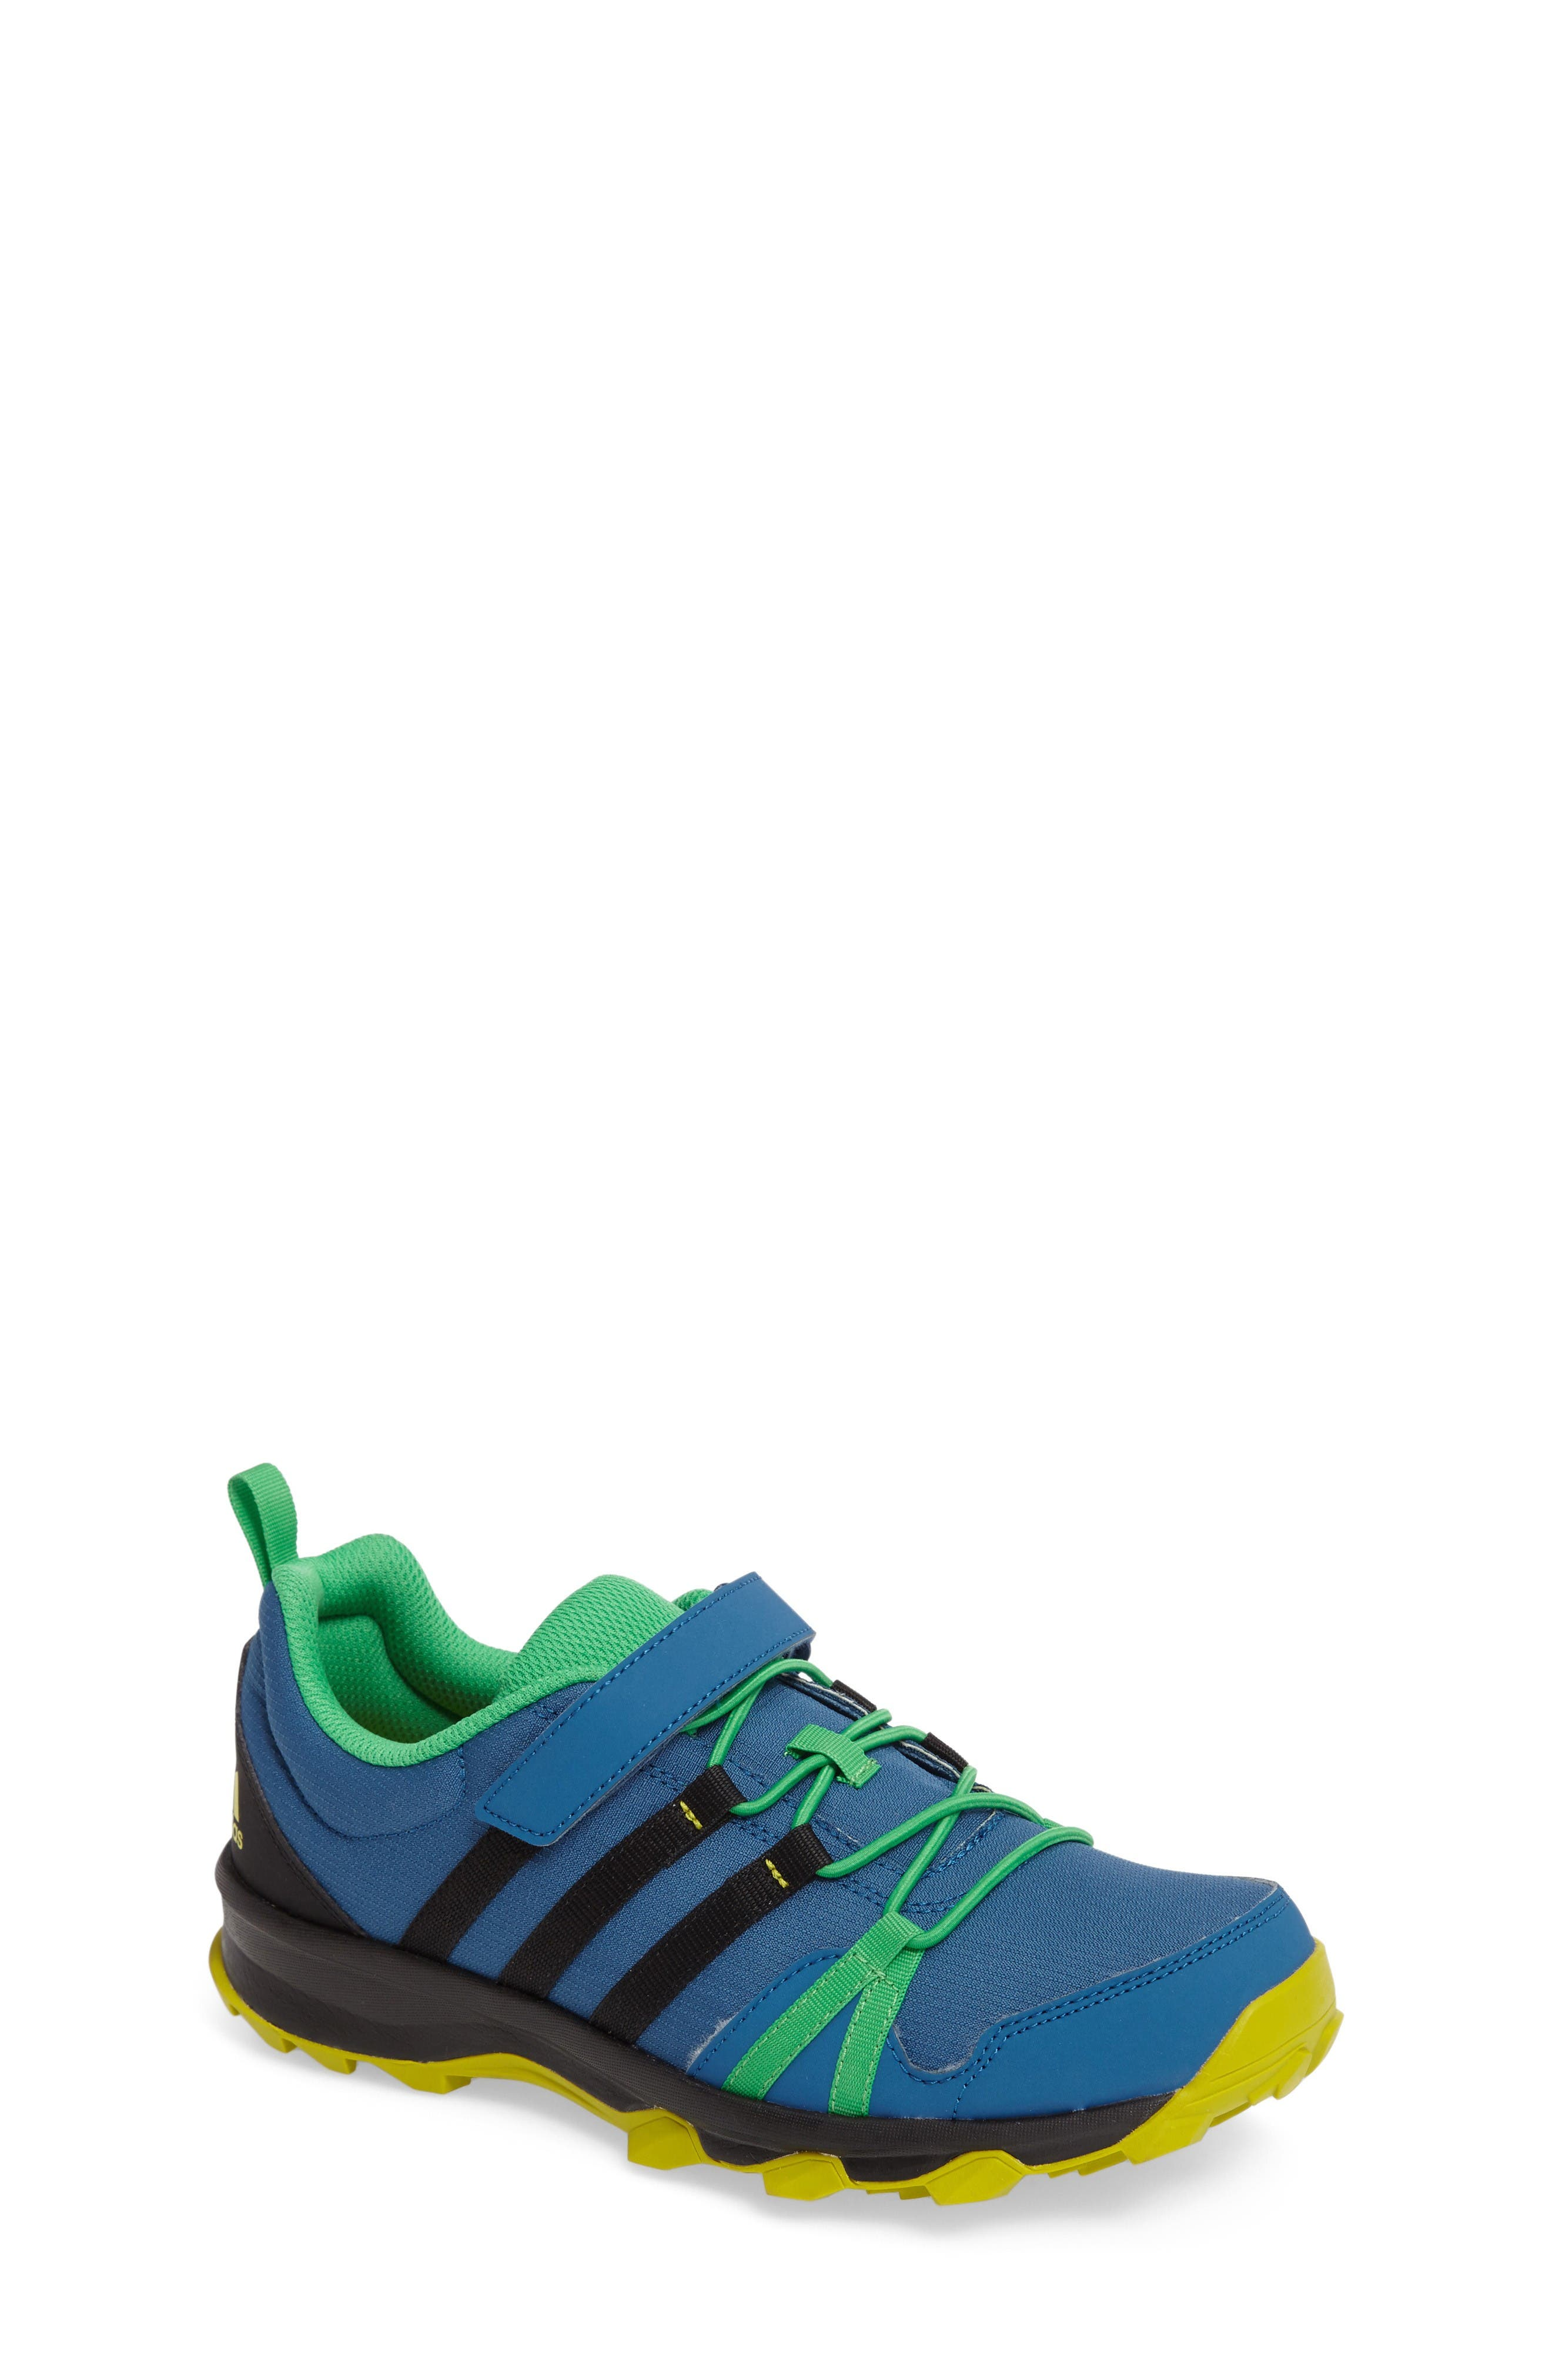 Alternate Image 1 Selected - adidas Tracerocker Sneaker (Toddler, Little Kid & Big Kid)